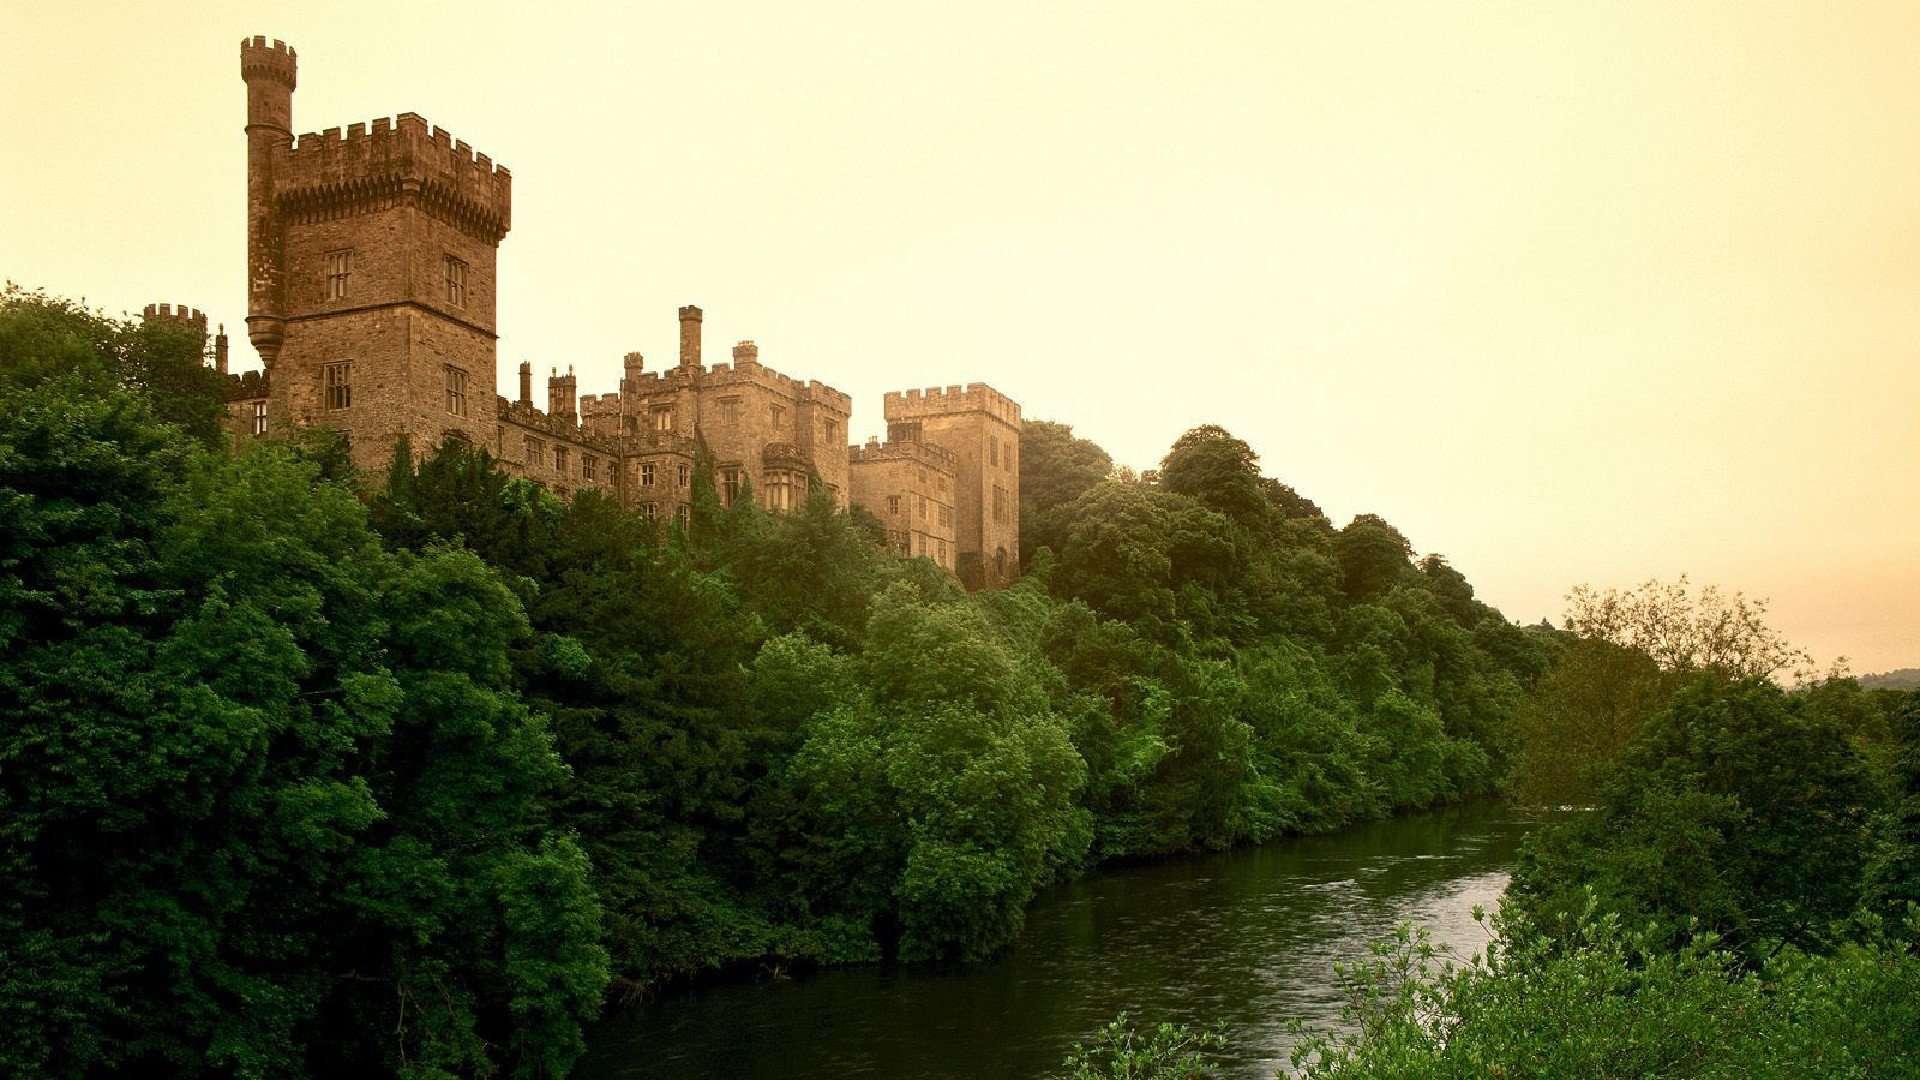 Castle Wallpaper 019